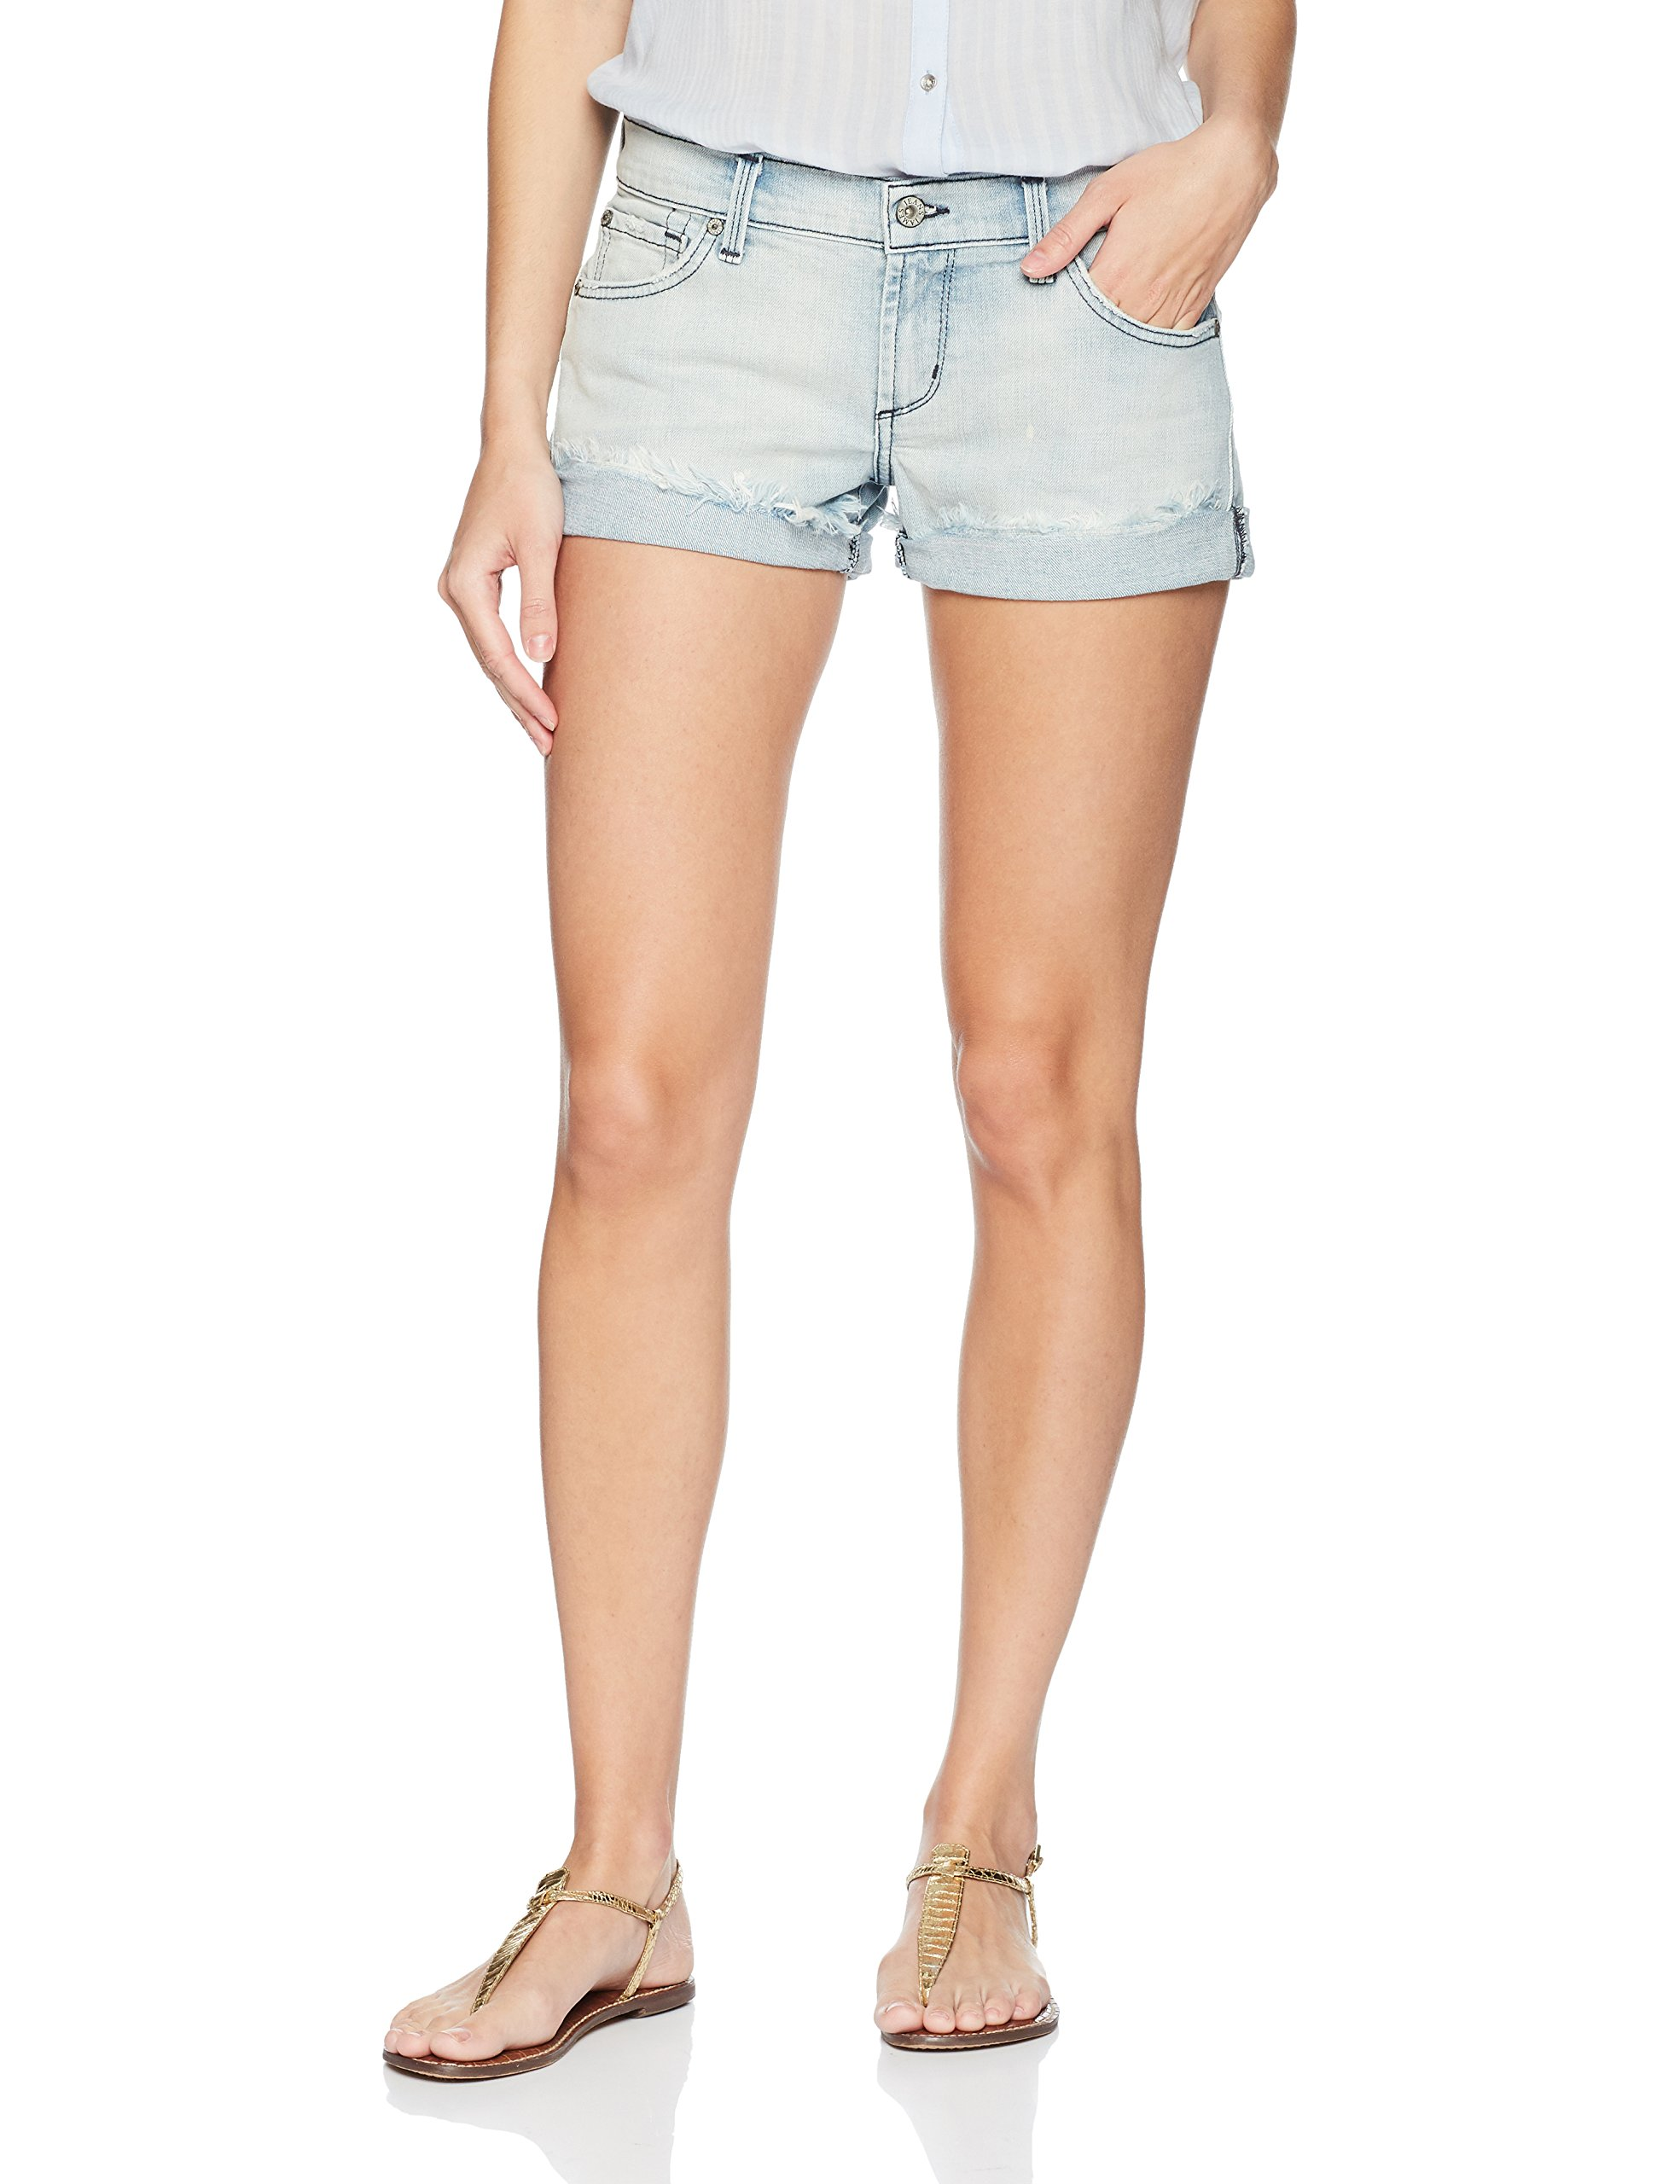 James Jeans Women's Charlie Rolled Hem Baggy Boyfriend Shorts, Crossroads, 29